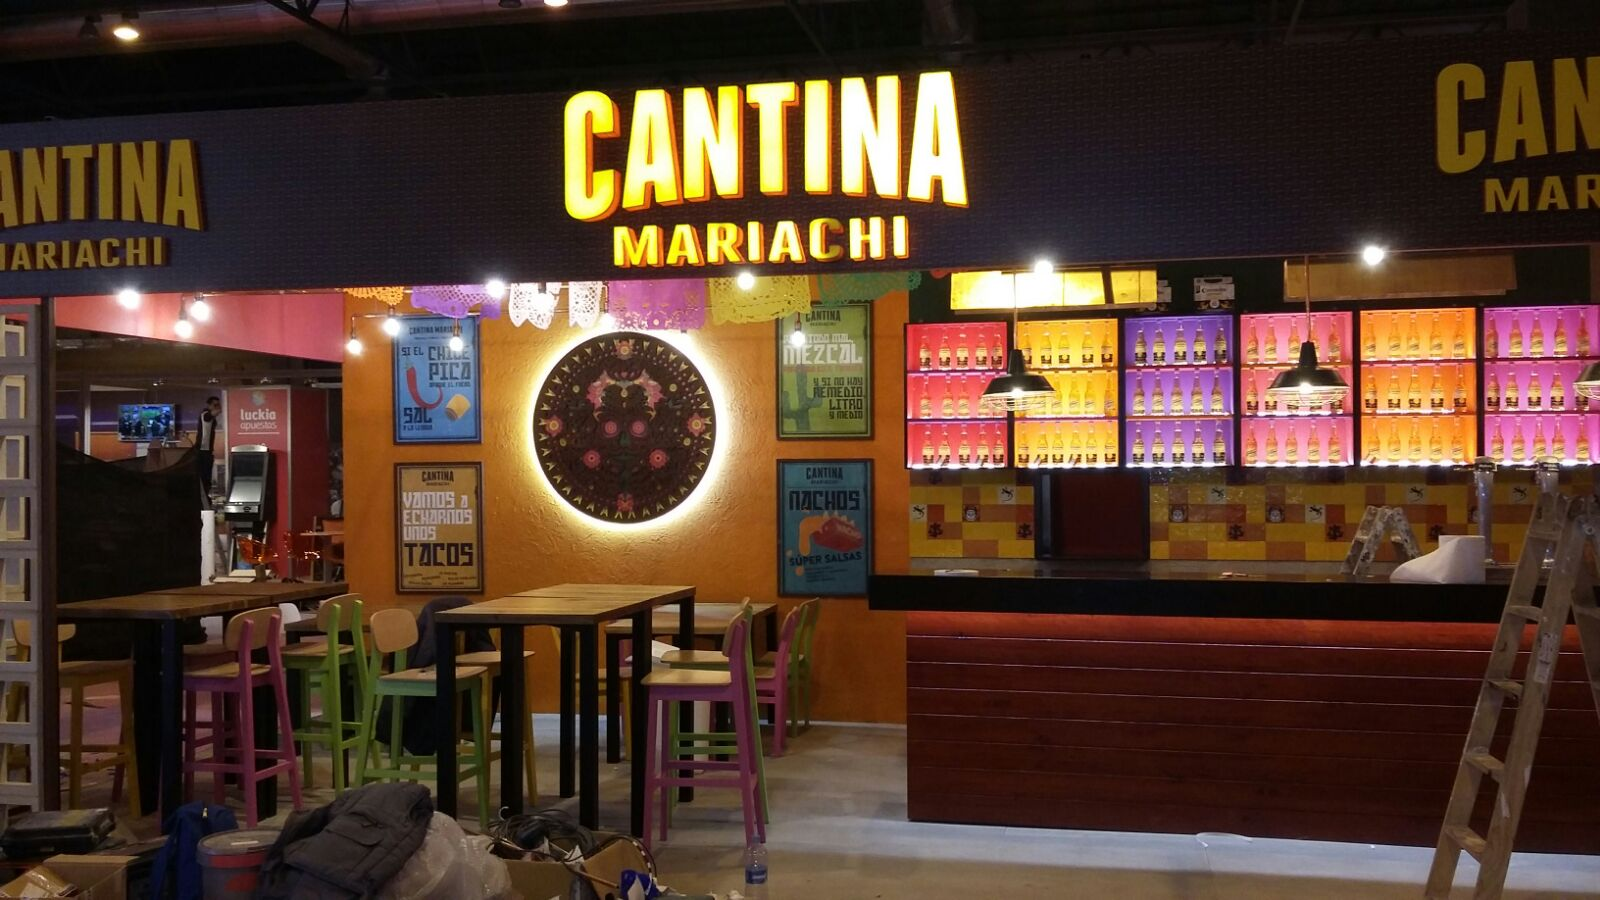 Cantina Mariachi (Expofranquicias)